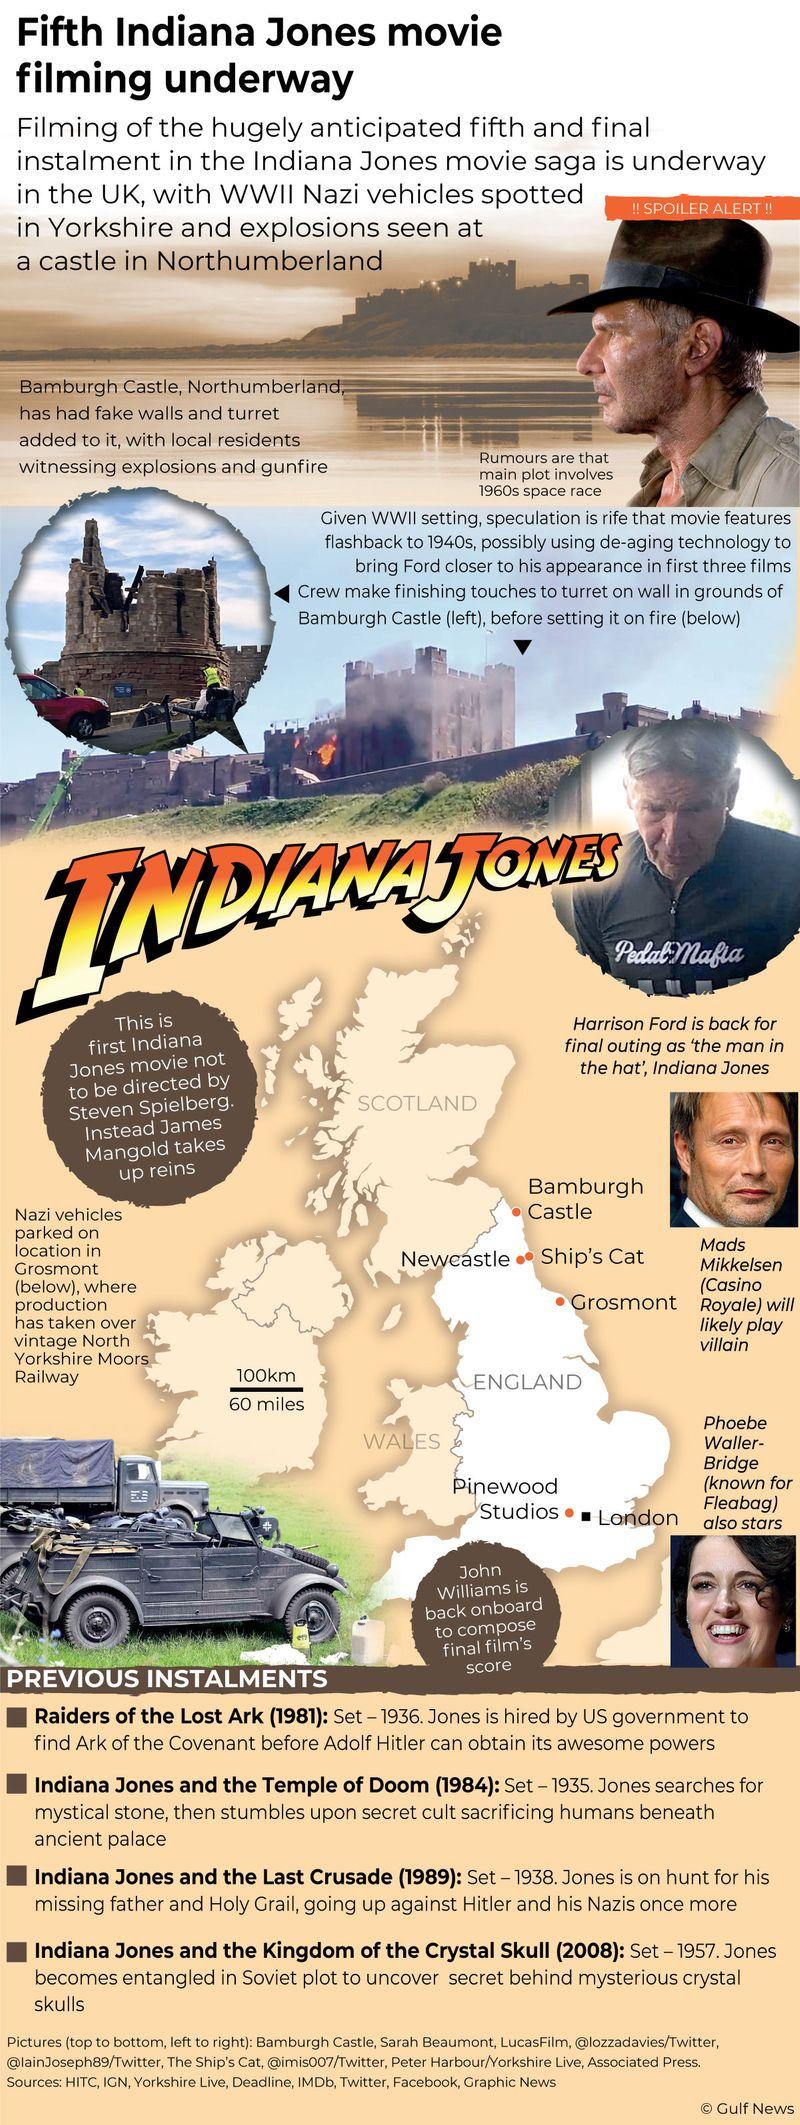 Infographic: Fifth Indiana Jones movie filming underway